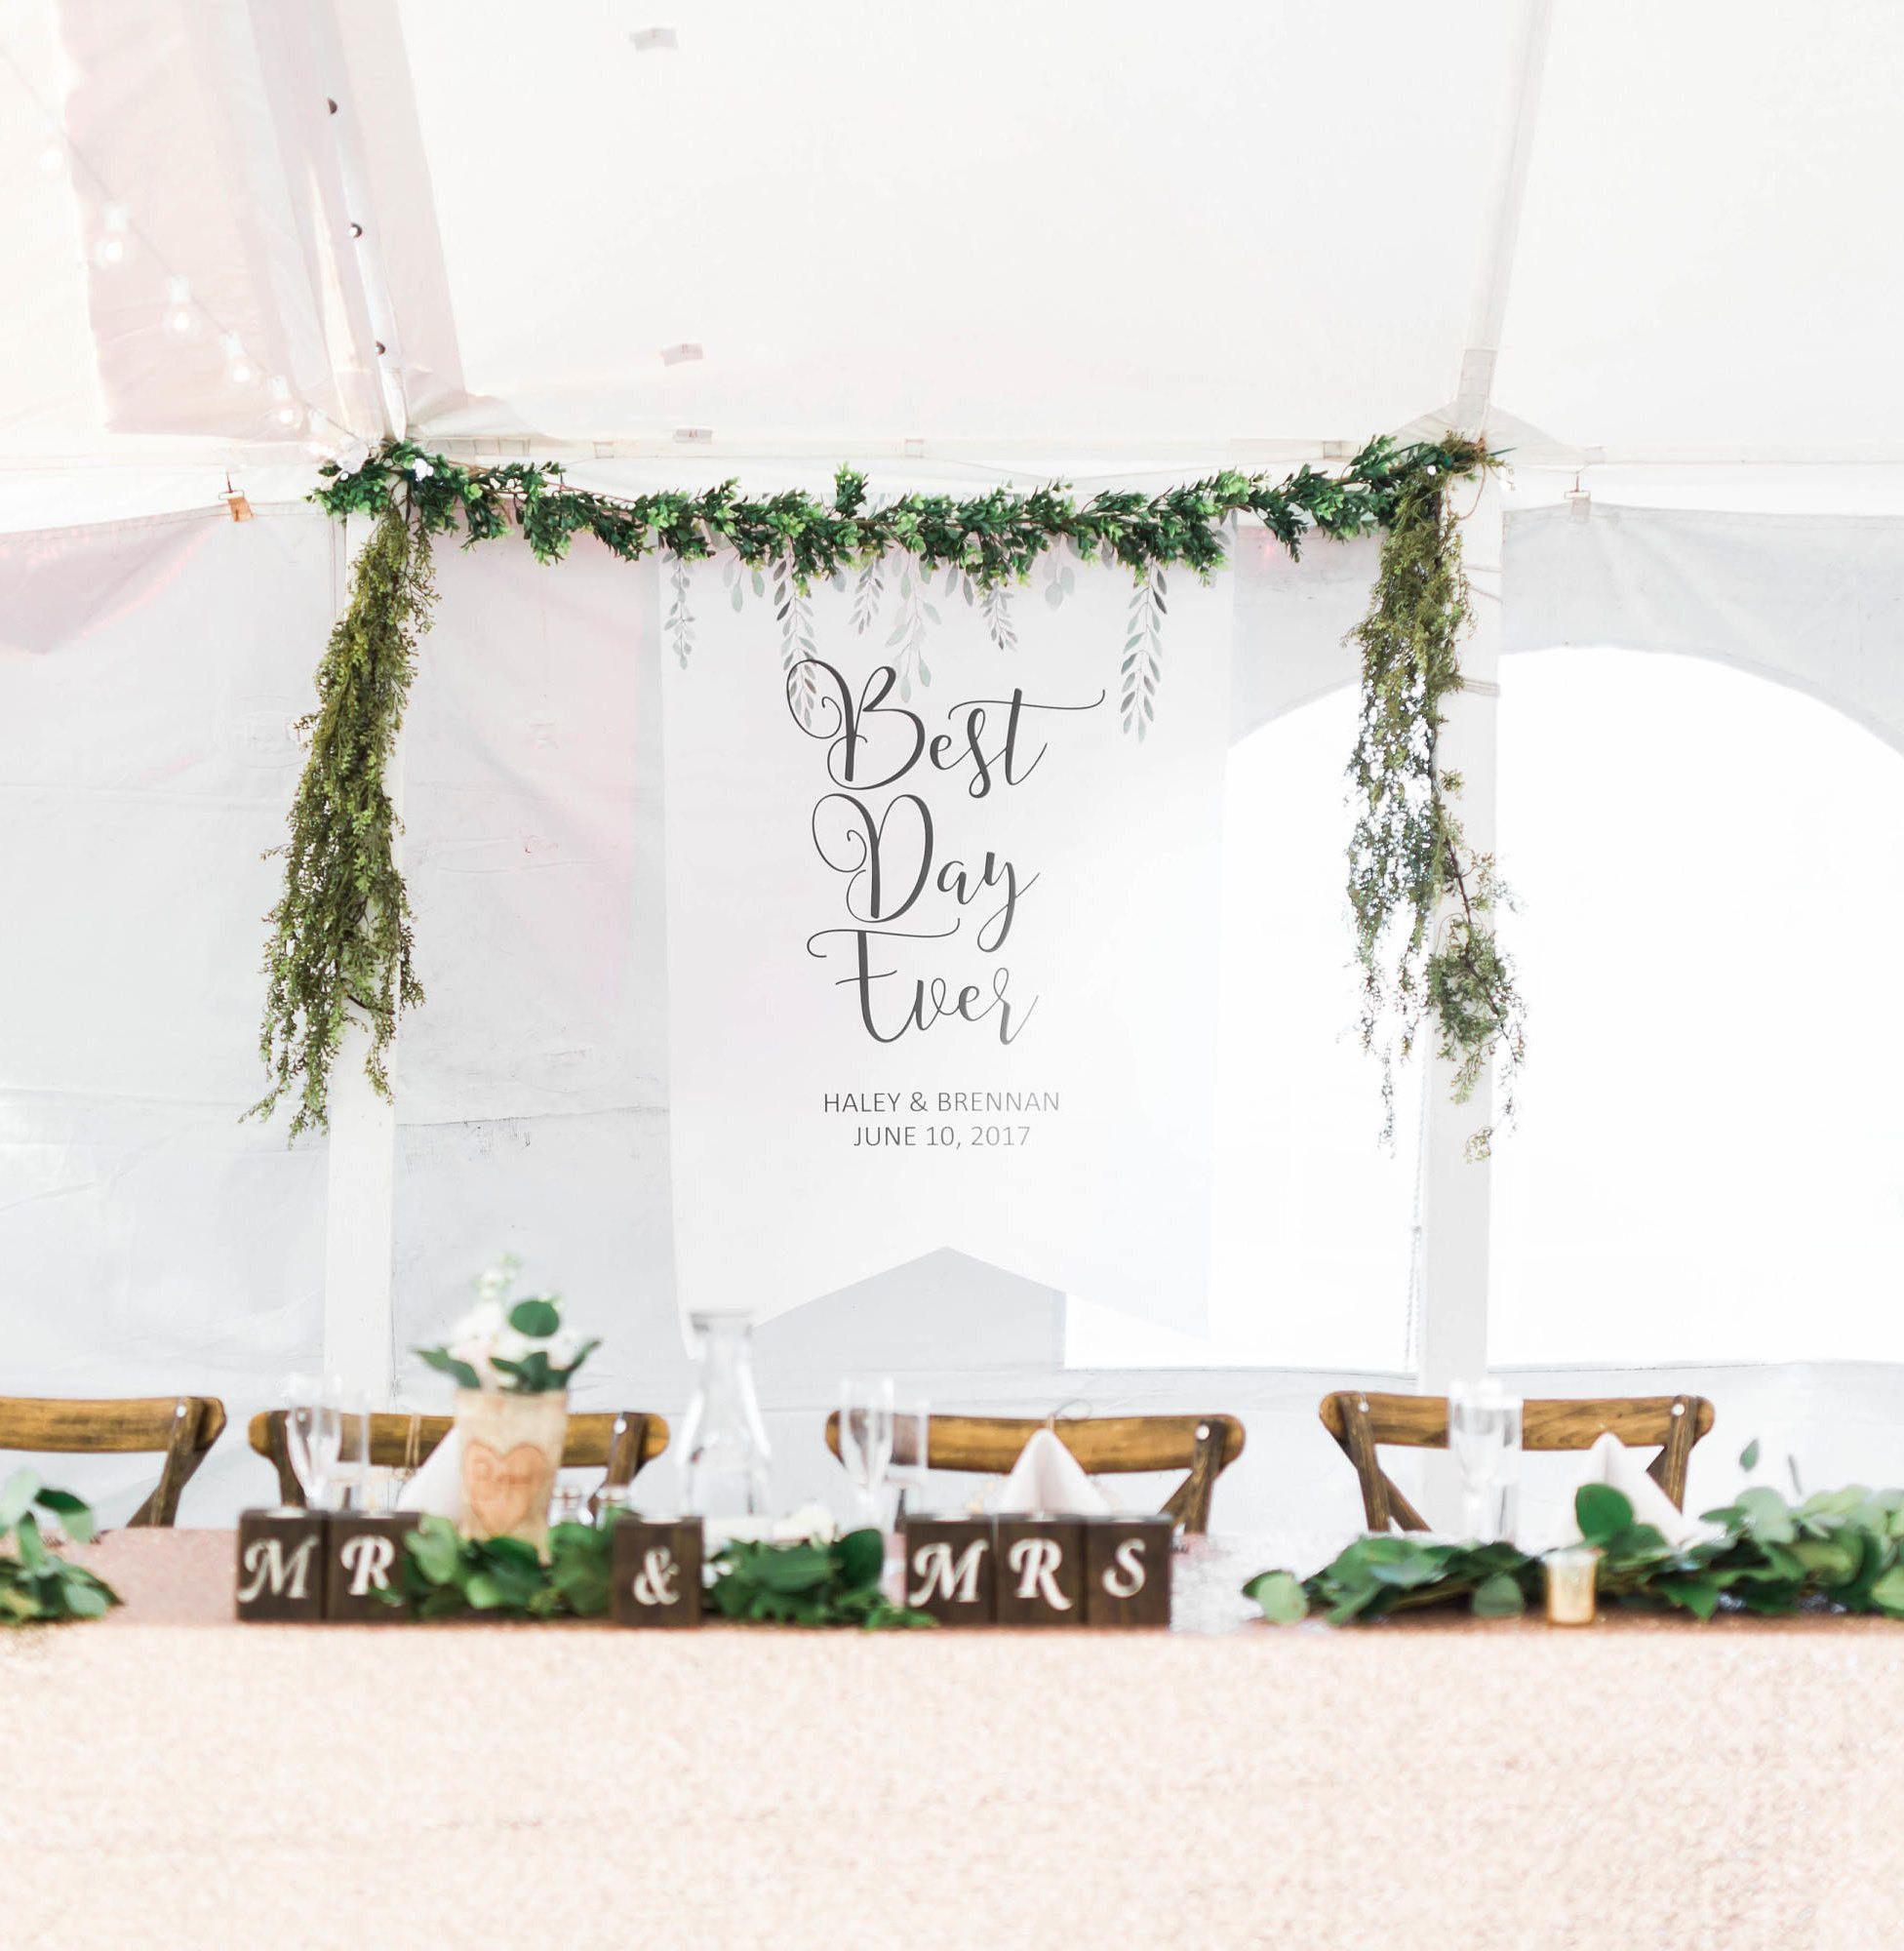 Boho Wedding Backdrop Sign Banner With